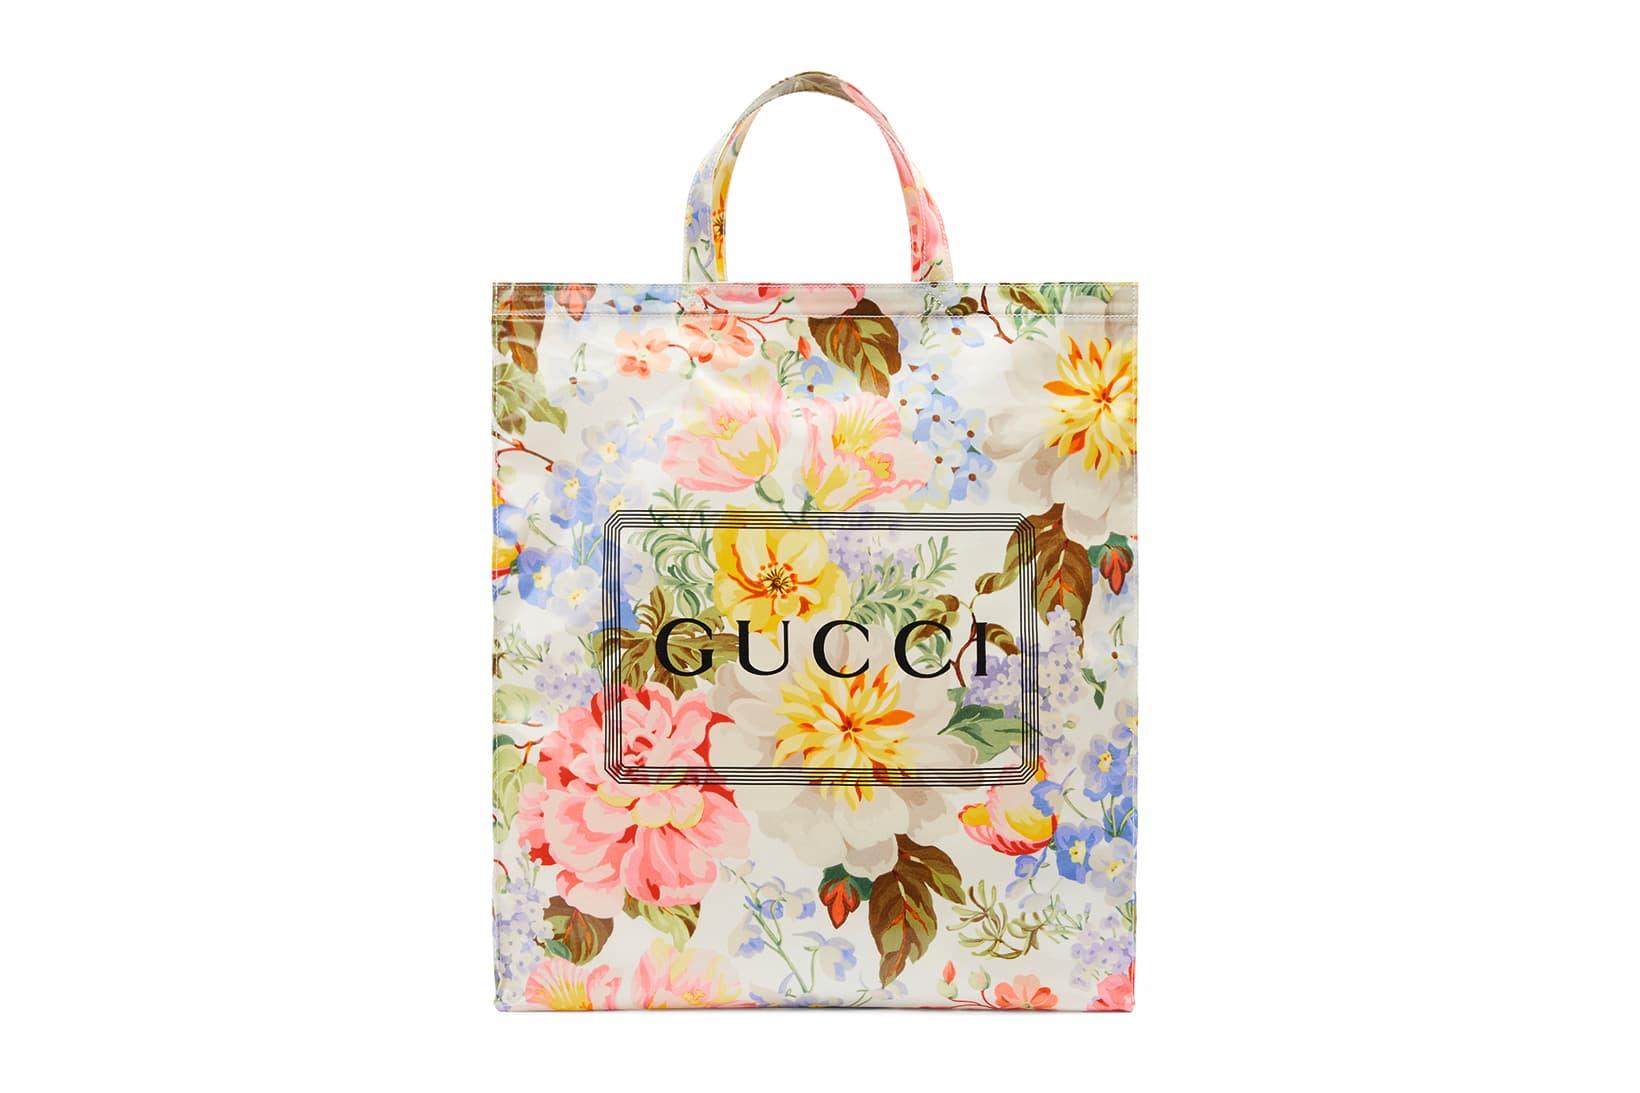 Gucci Shopper Tote Bags Floral & Check Pattern   HYPEBAE